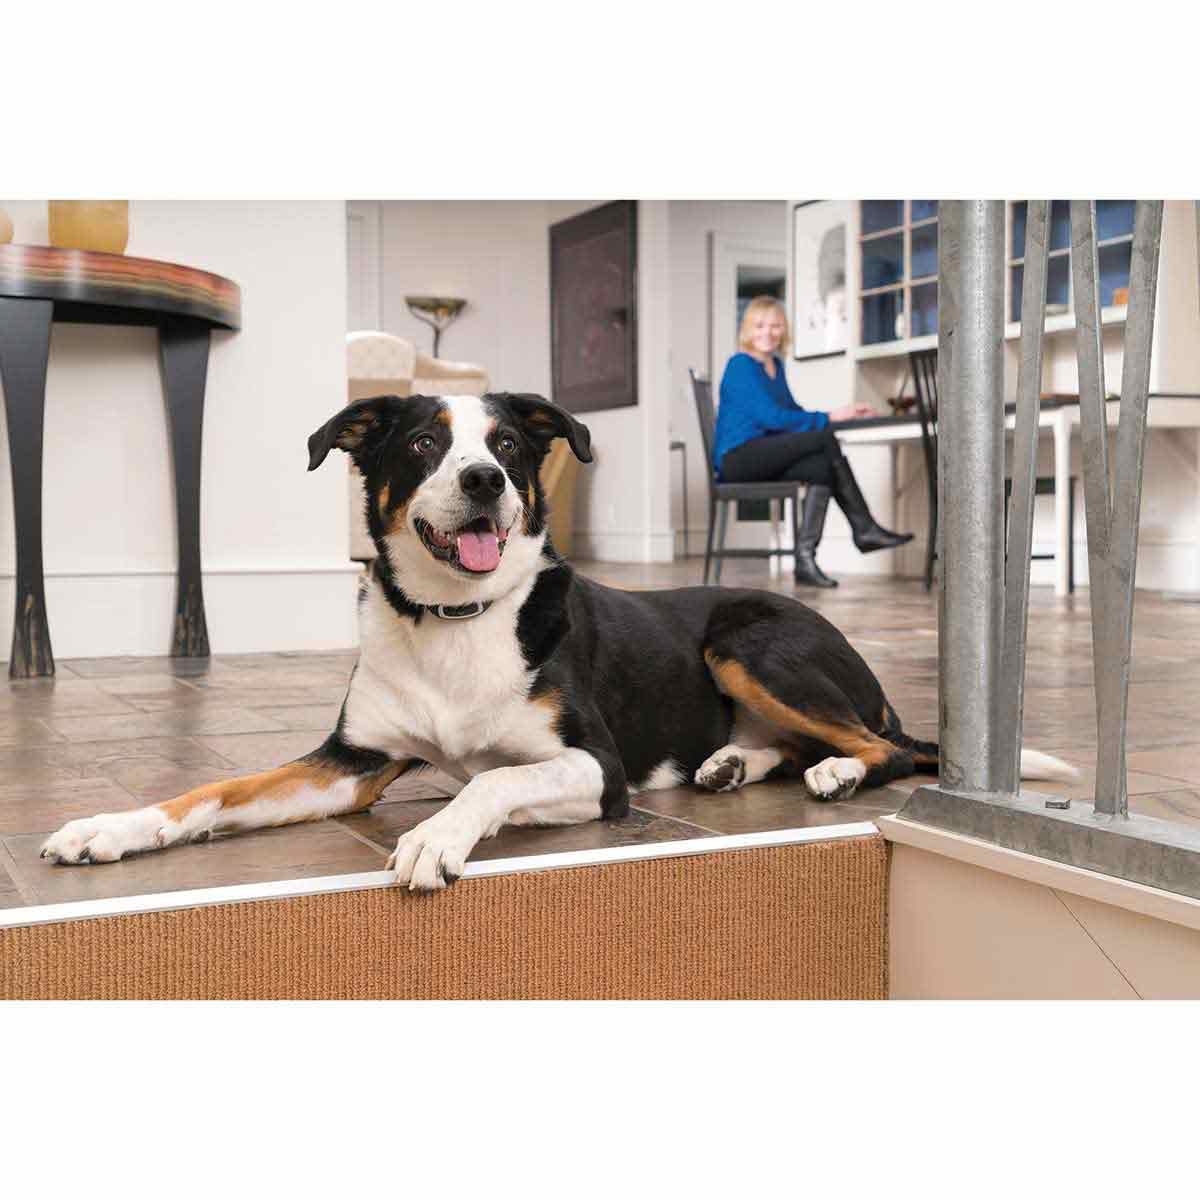 Dog wearing PetSafe Yard Remote Trainer 300 Yard